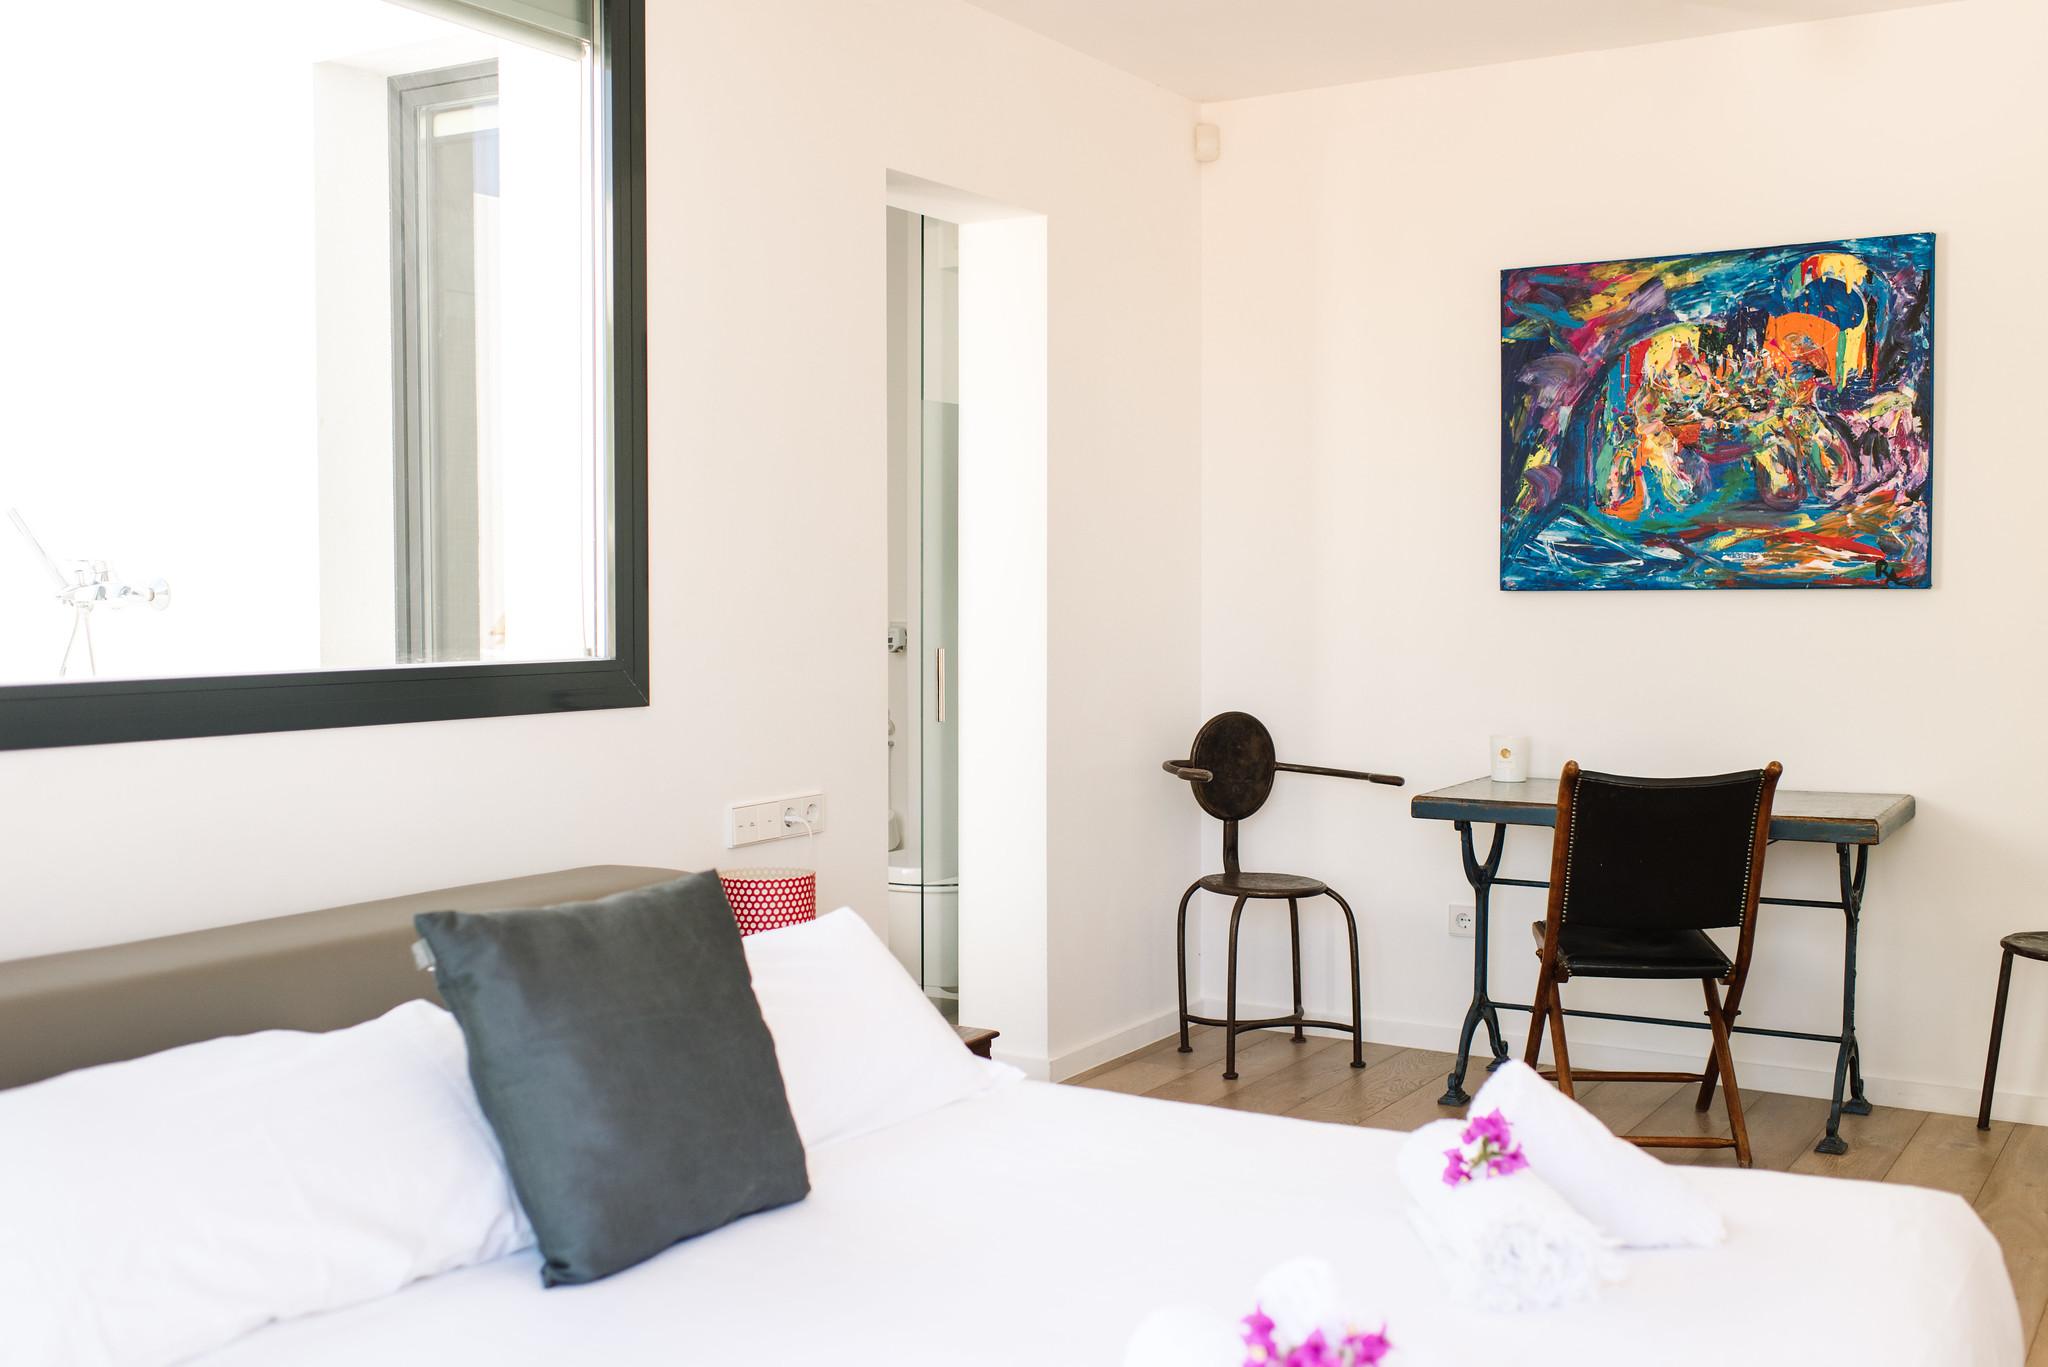 https://www.white-ibiza.com/wp-content/uploads/2020/06/white-ibiza-villas-can-jondal-interior-bedroom-1.jpg